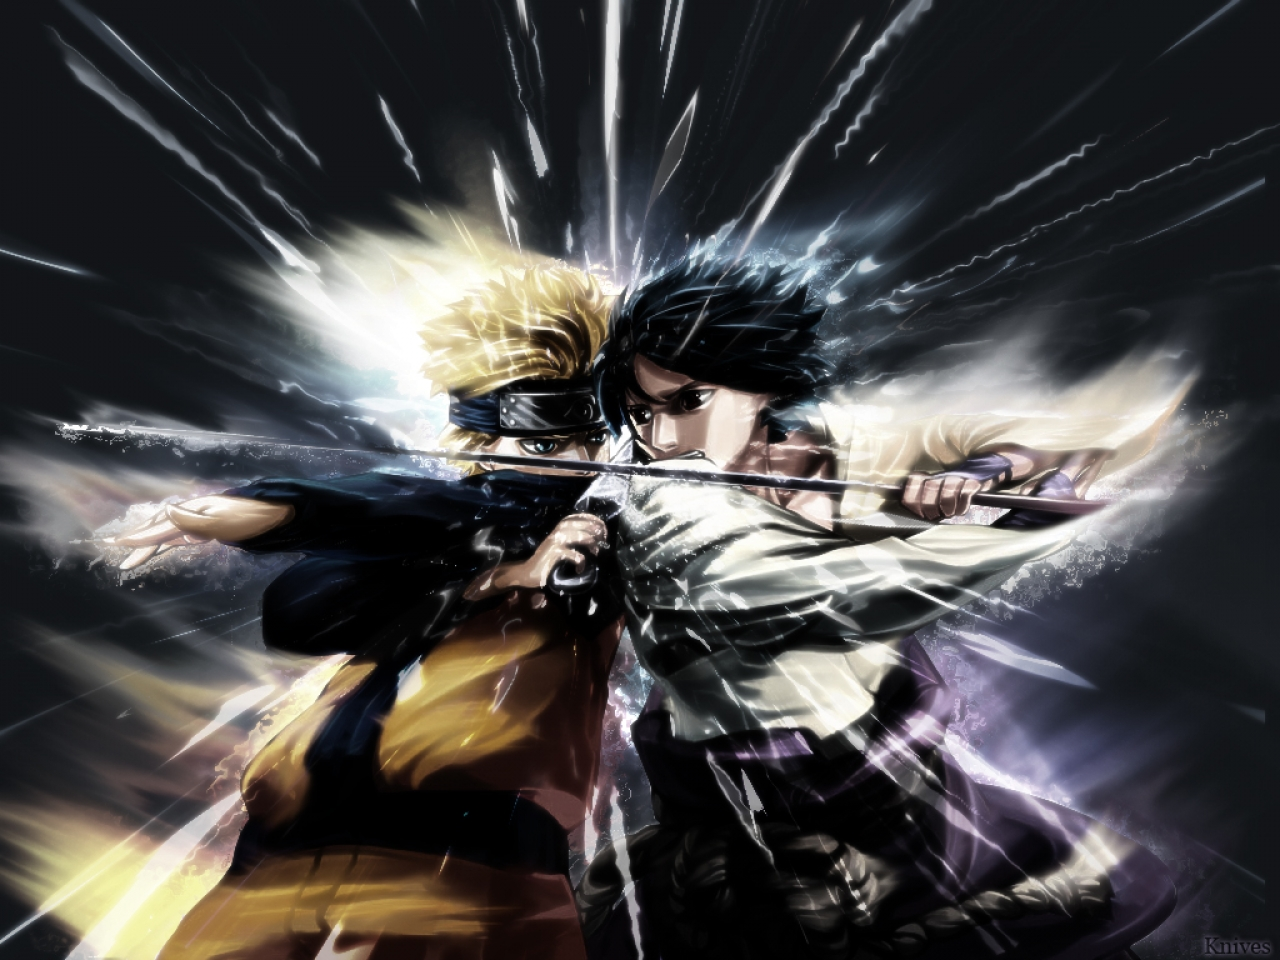 Wallpaper Keren: Special Naruto Vs Sasuke Wallpaper